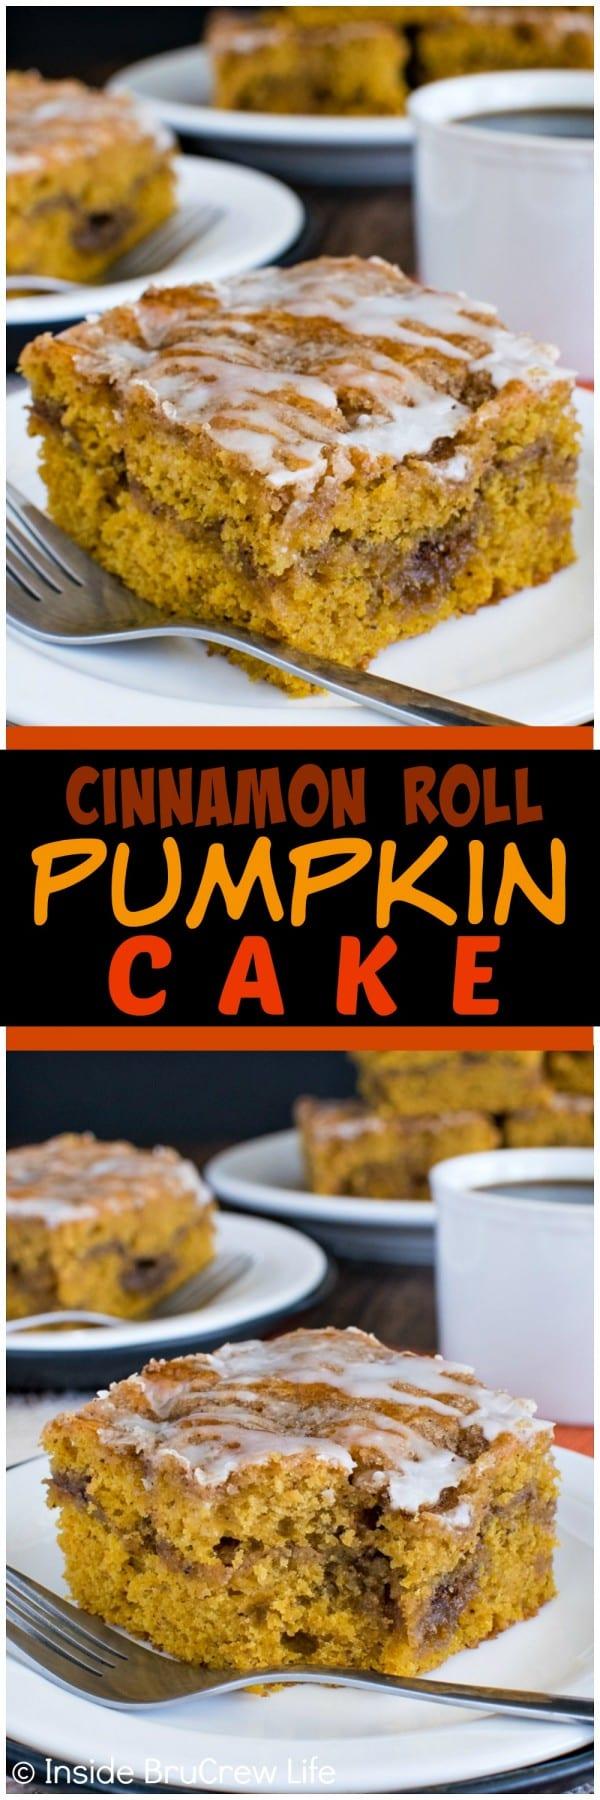 Cinnamon Roll Pumpkin Cake - pockets of cinnamon sugar make this ...